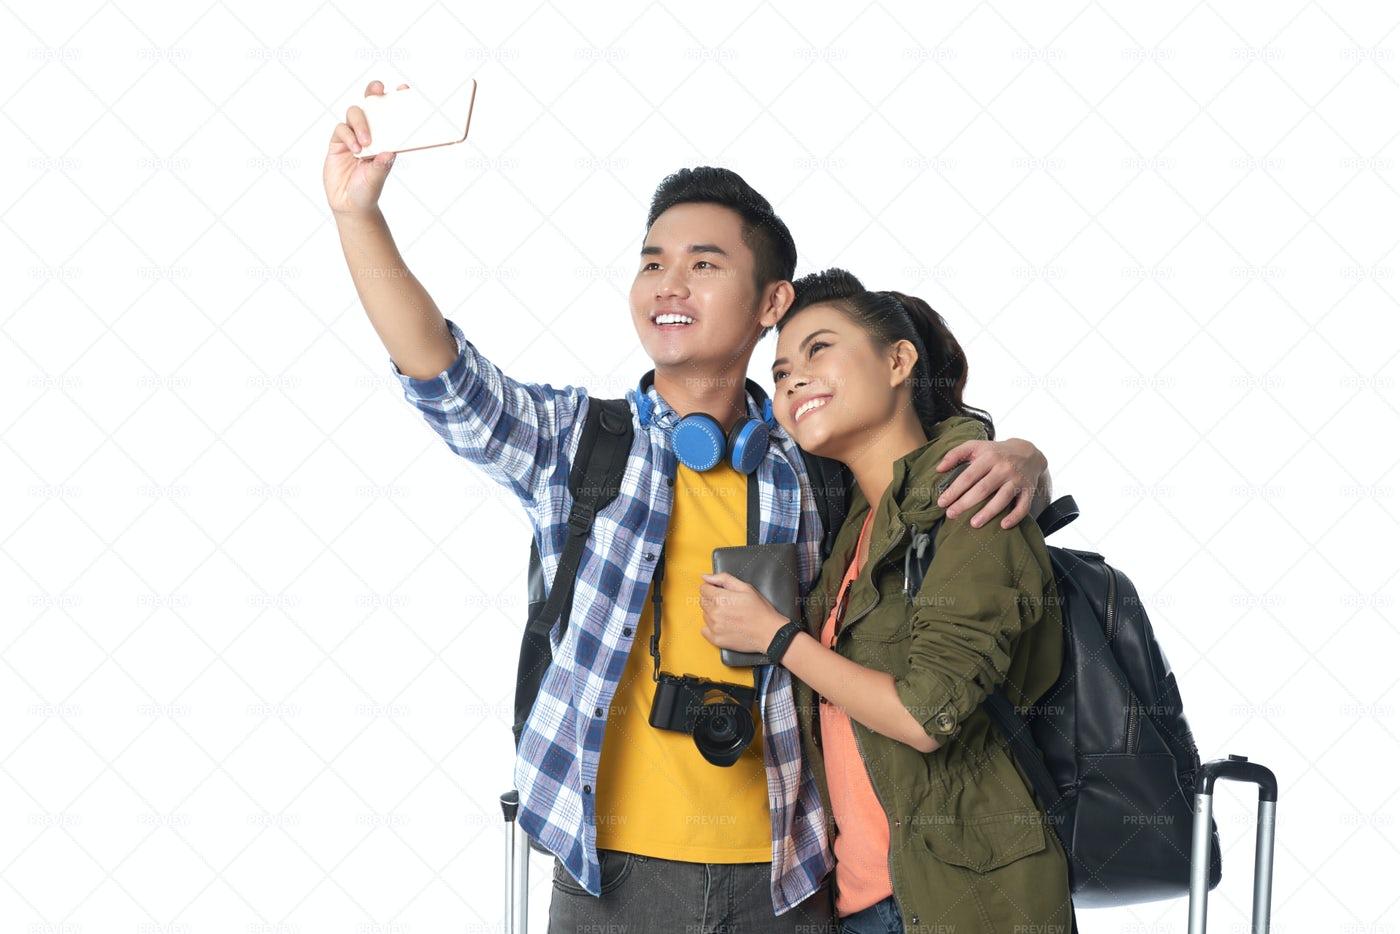 Asian Travelers Taking Selfie: Stock Photos